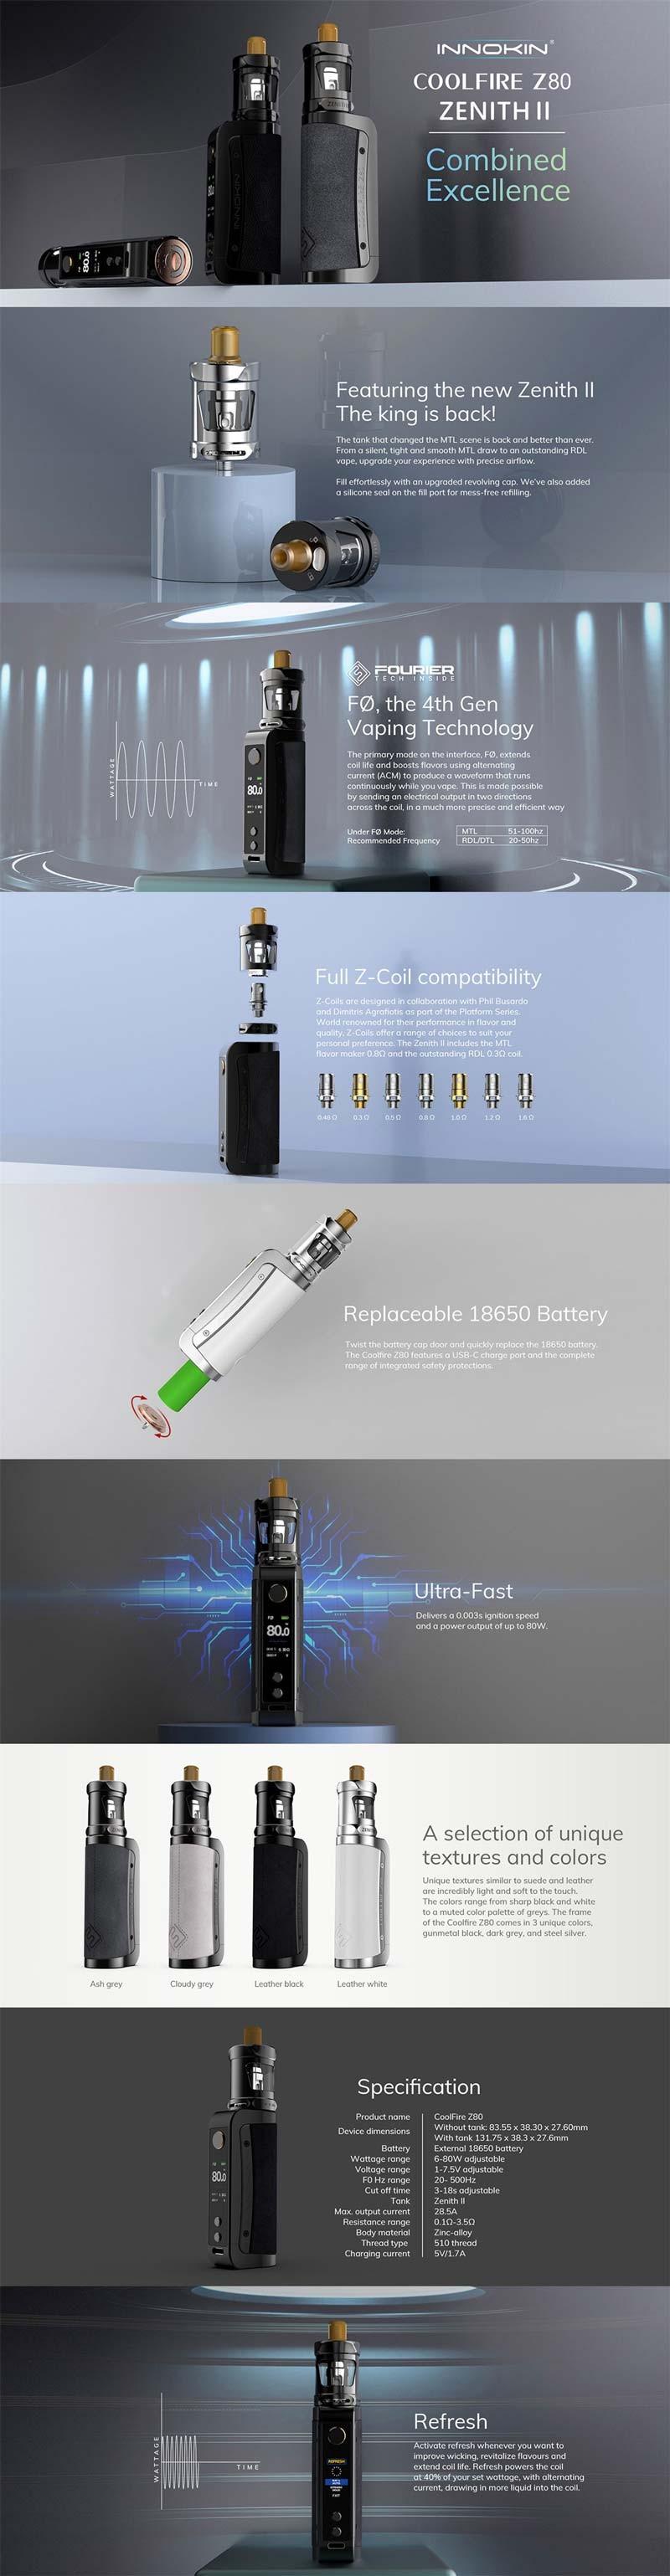 [Image: authentic-innokin-coolfire-z80-box-mod-k...-08ohm.jpg]